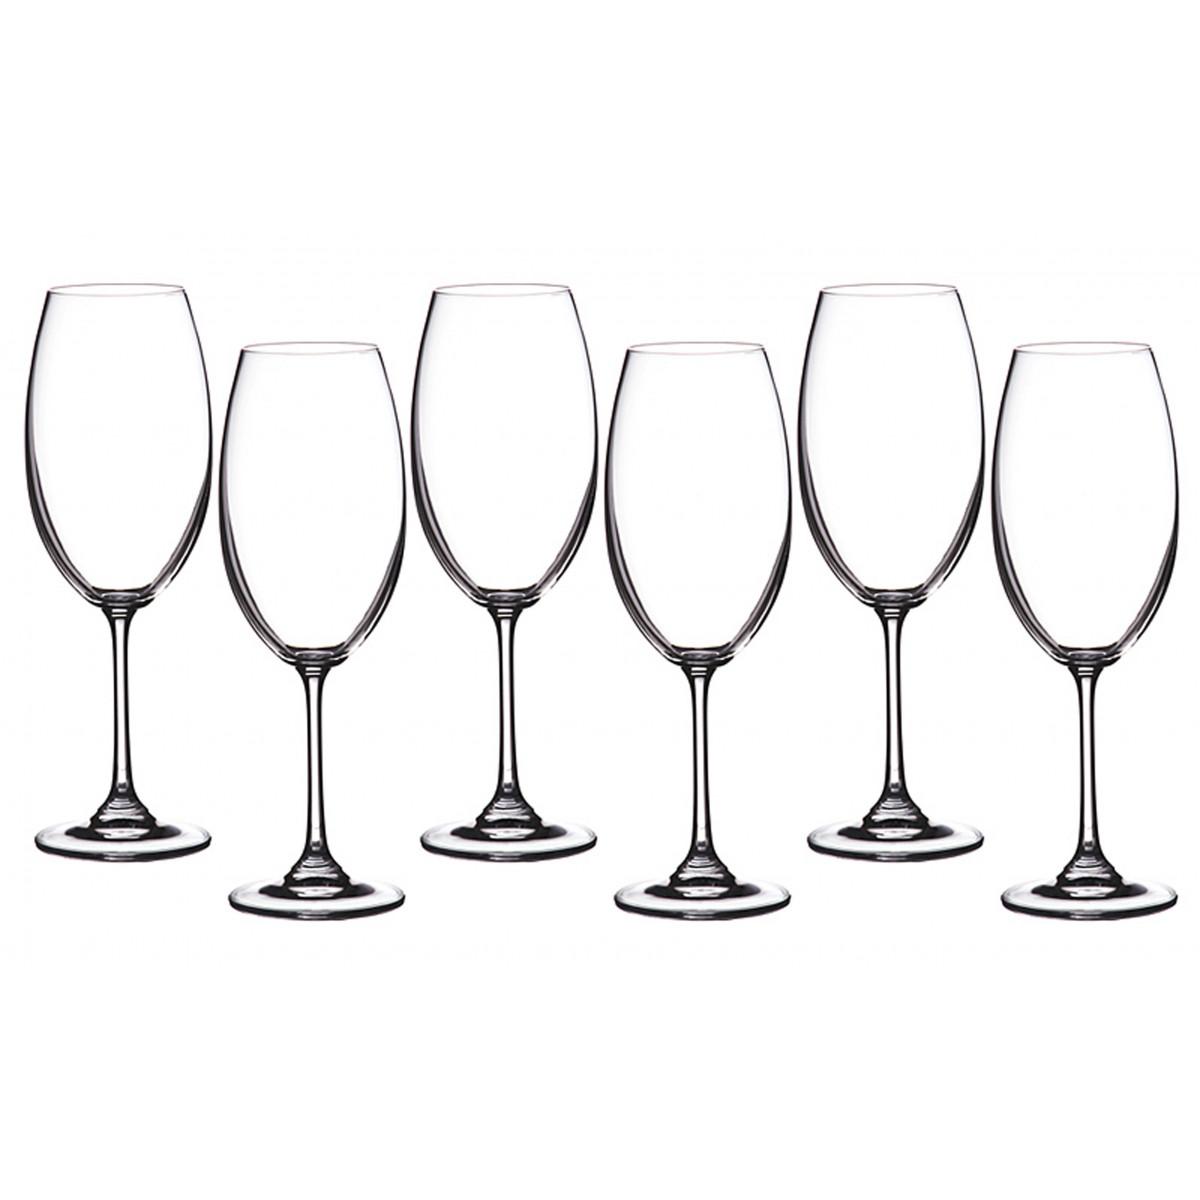 {} Crystalite Bohemia Набор бокалов для вина Gus (22 см - 6 шт) набор бокалов для бренди 6 шт crystalite bohemia набор бокалов для бренди 6 шт